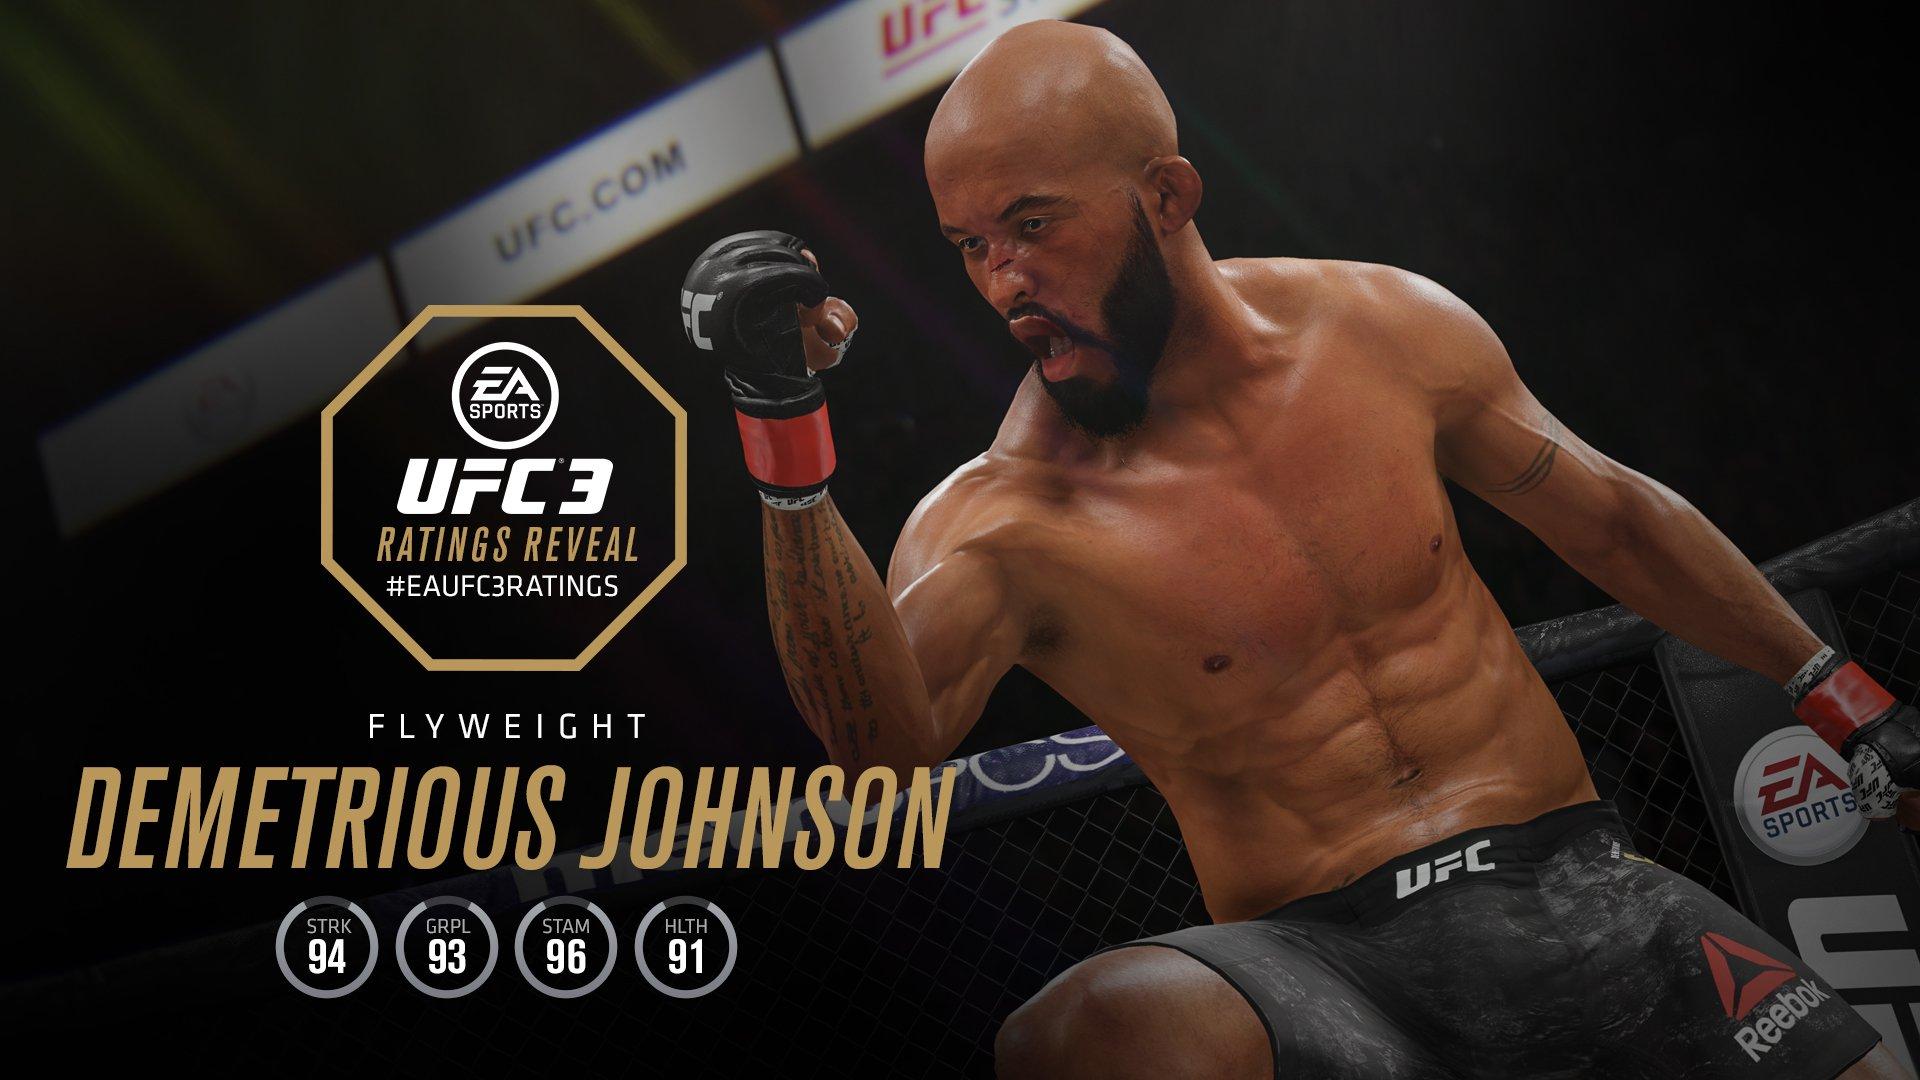 EA Sports UFC 3 Demetrious Johnson ratings